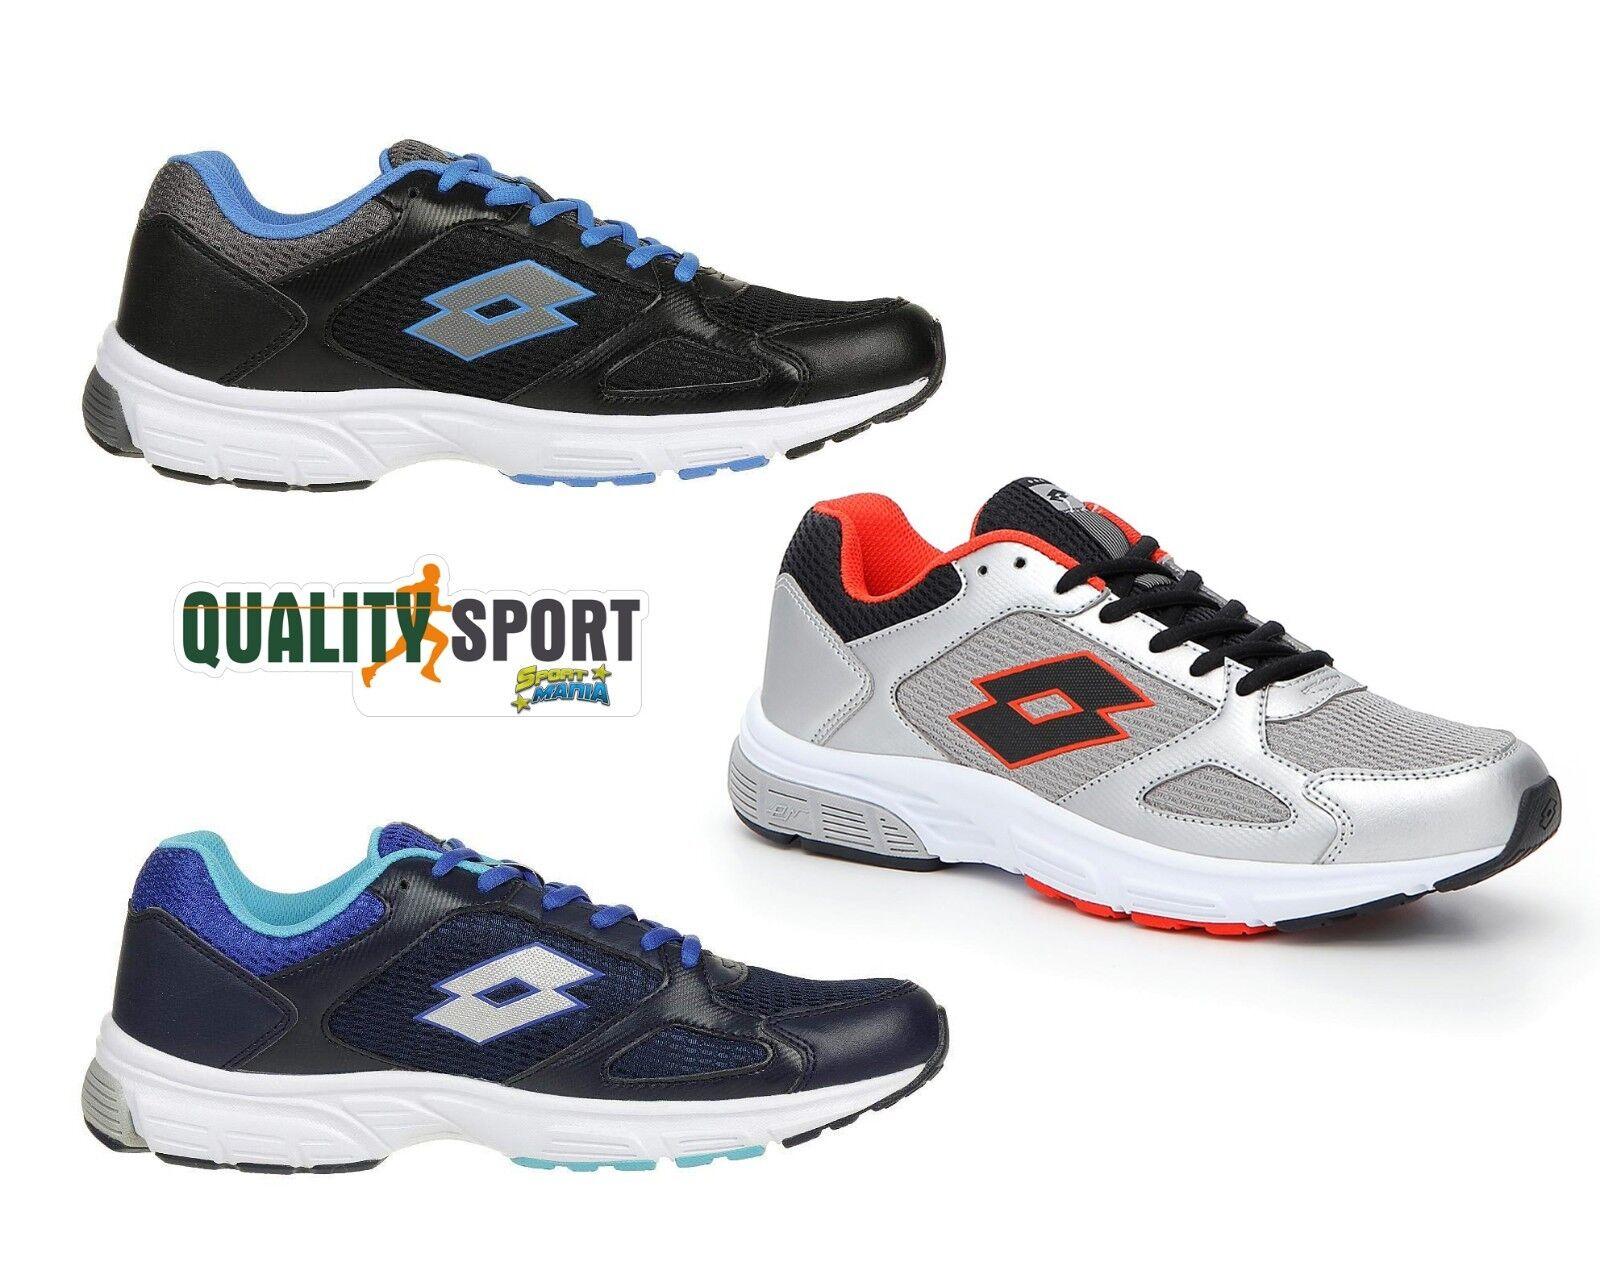 Lotto Speedride 600 IV shoes shoes men Running Palestra Fitness Offerta